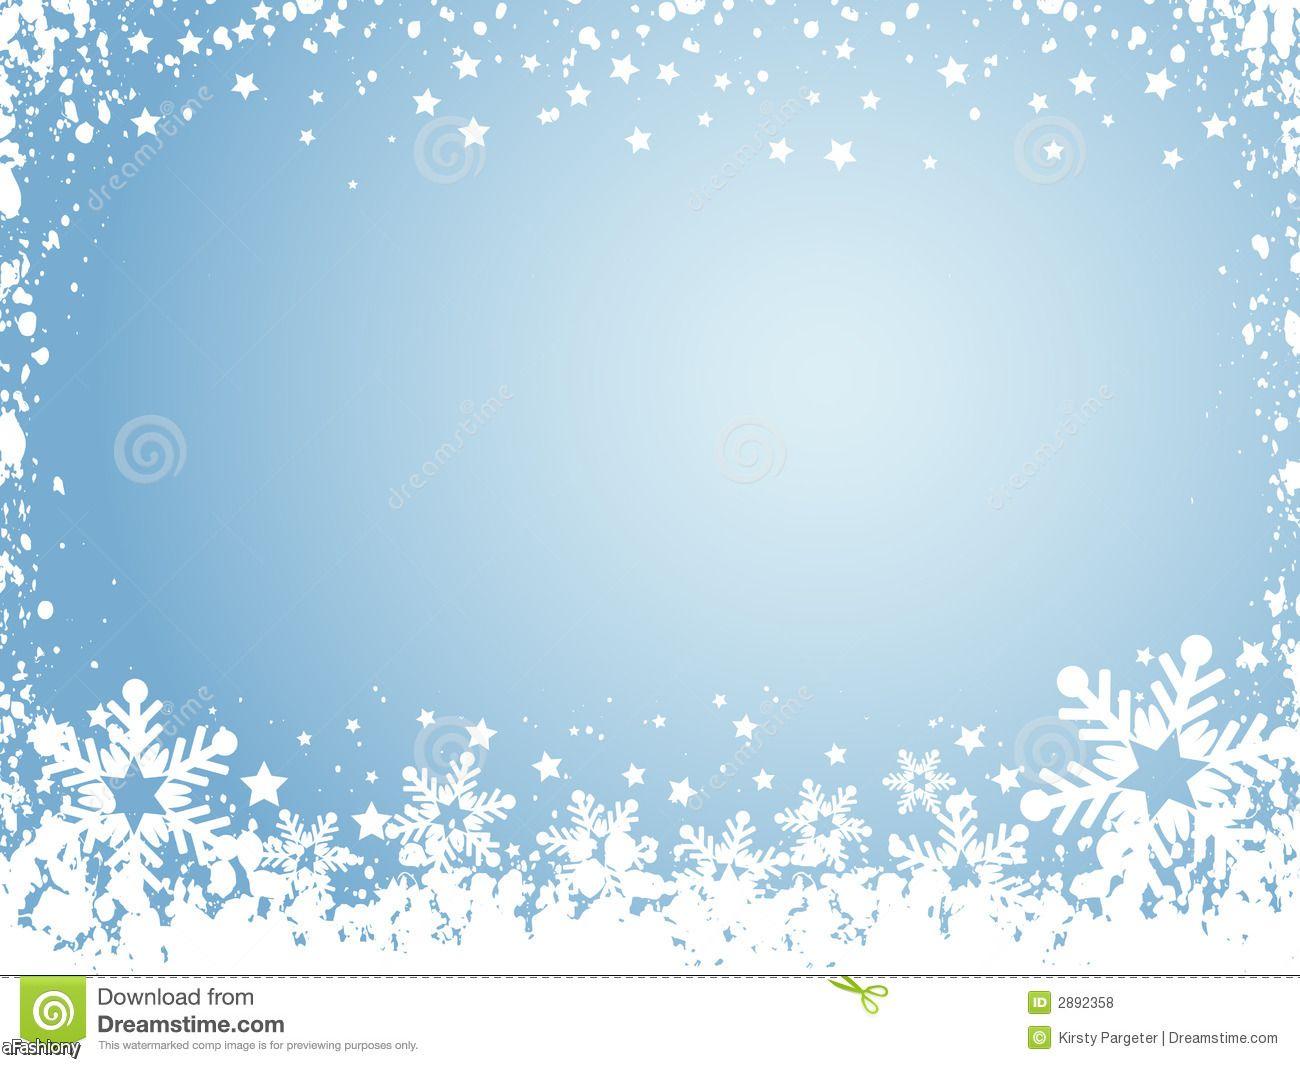 Snowflake background wallpapersafari